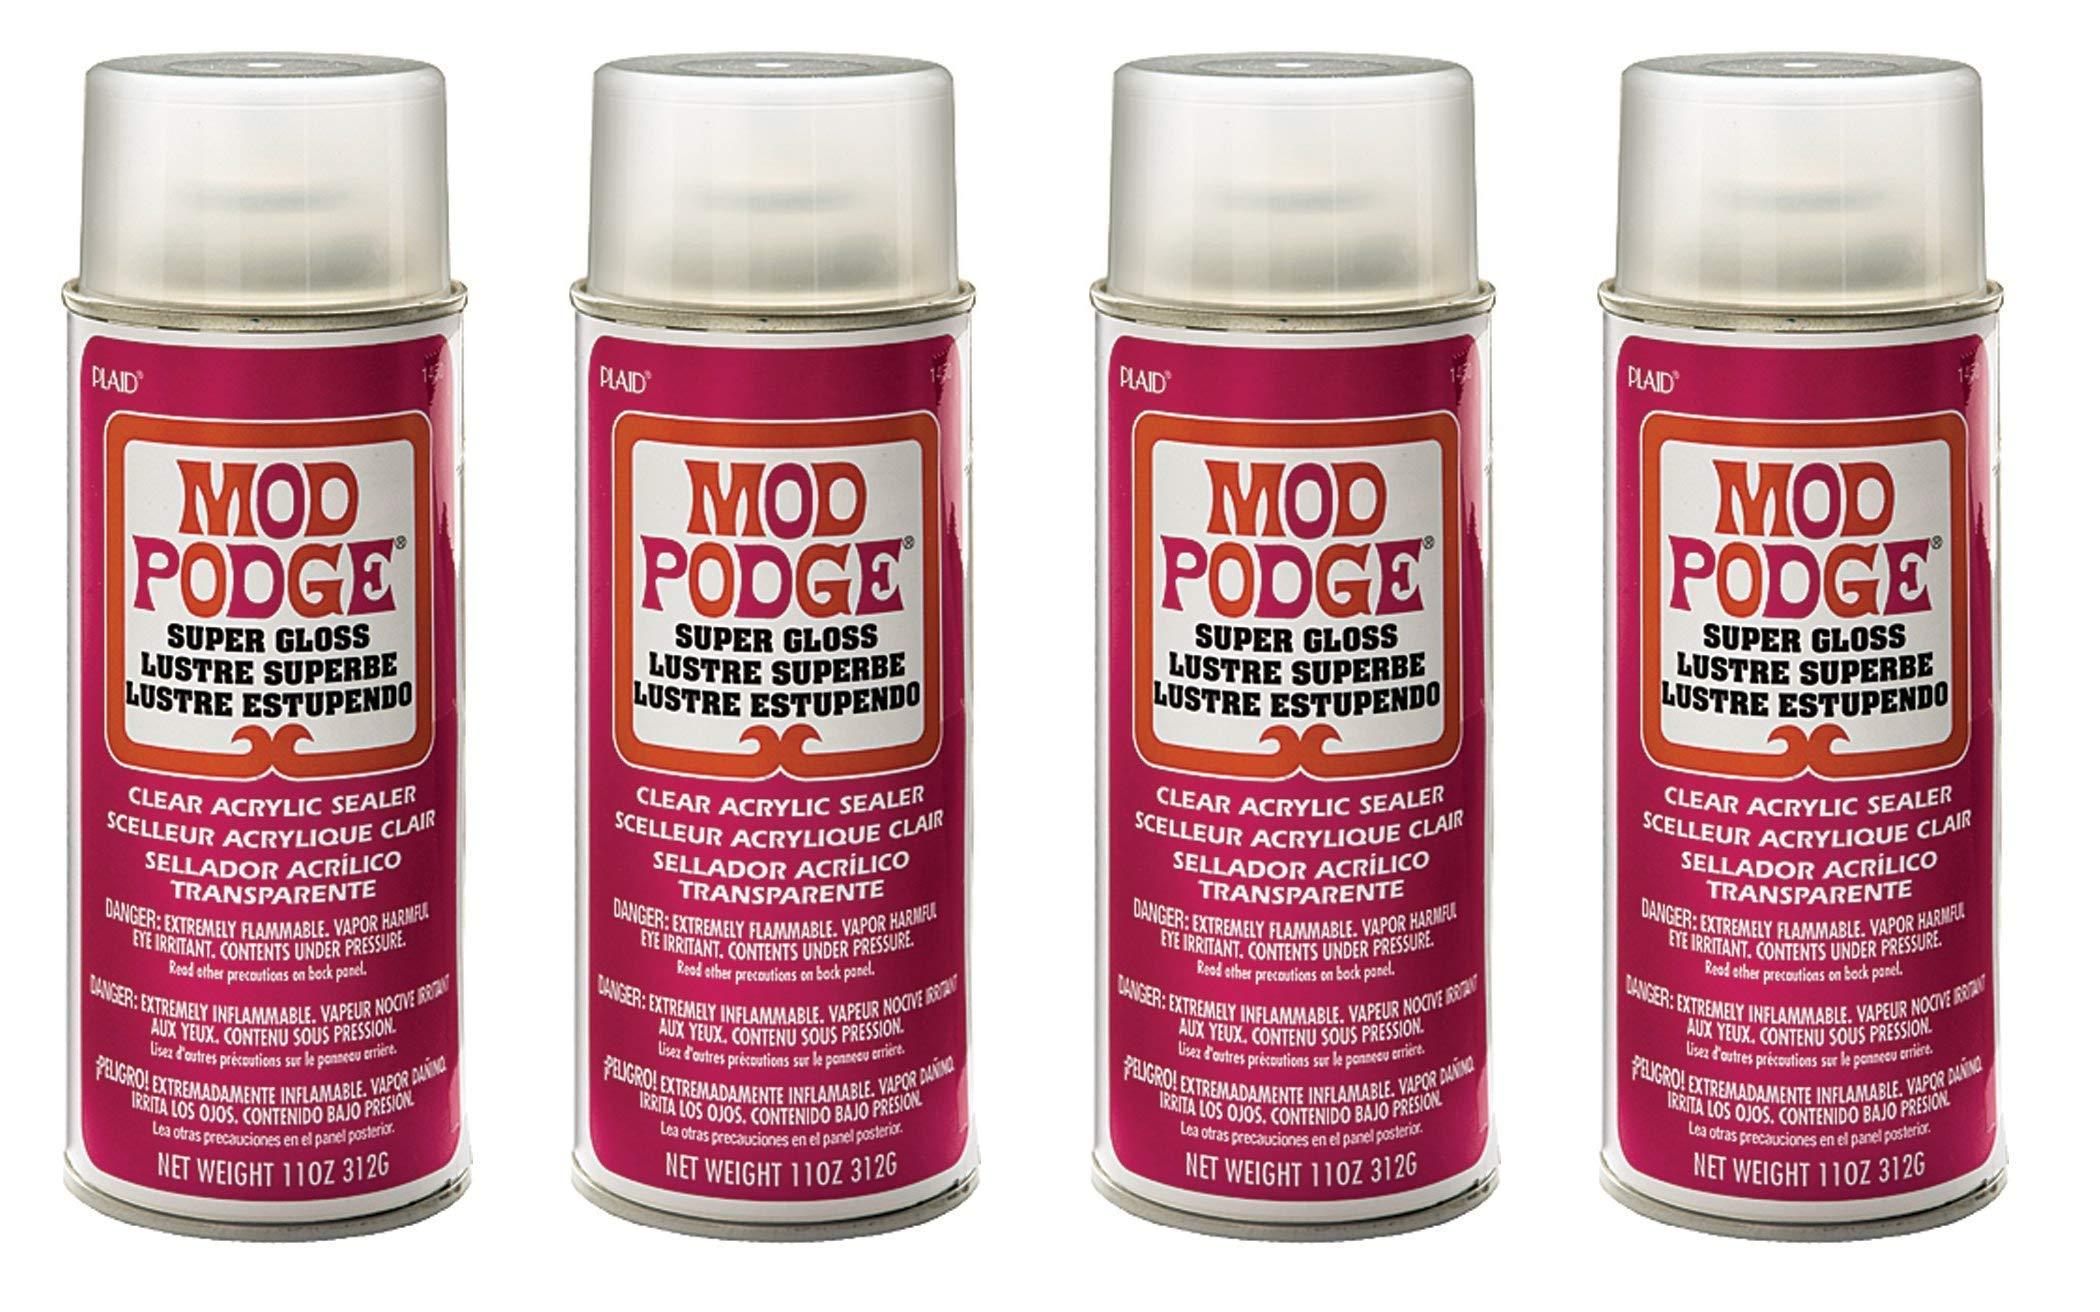 Mod Podge Acrylic Sealer (11-Ounce), 1450 Super Gloss (Fоur Paсk) by Mod Podge (Image #1)